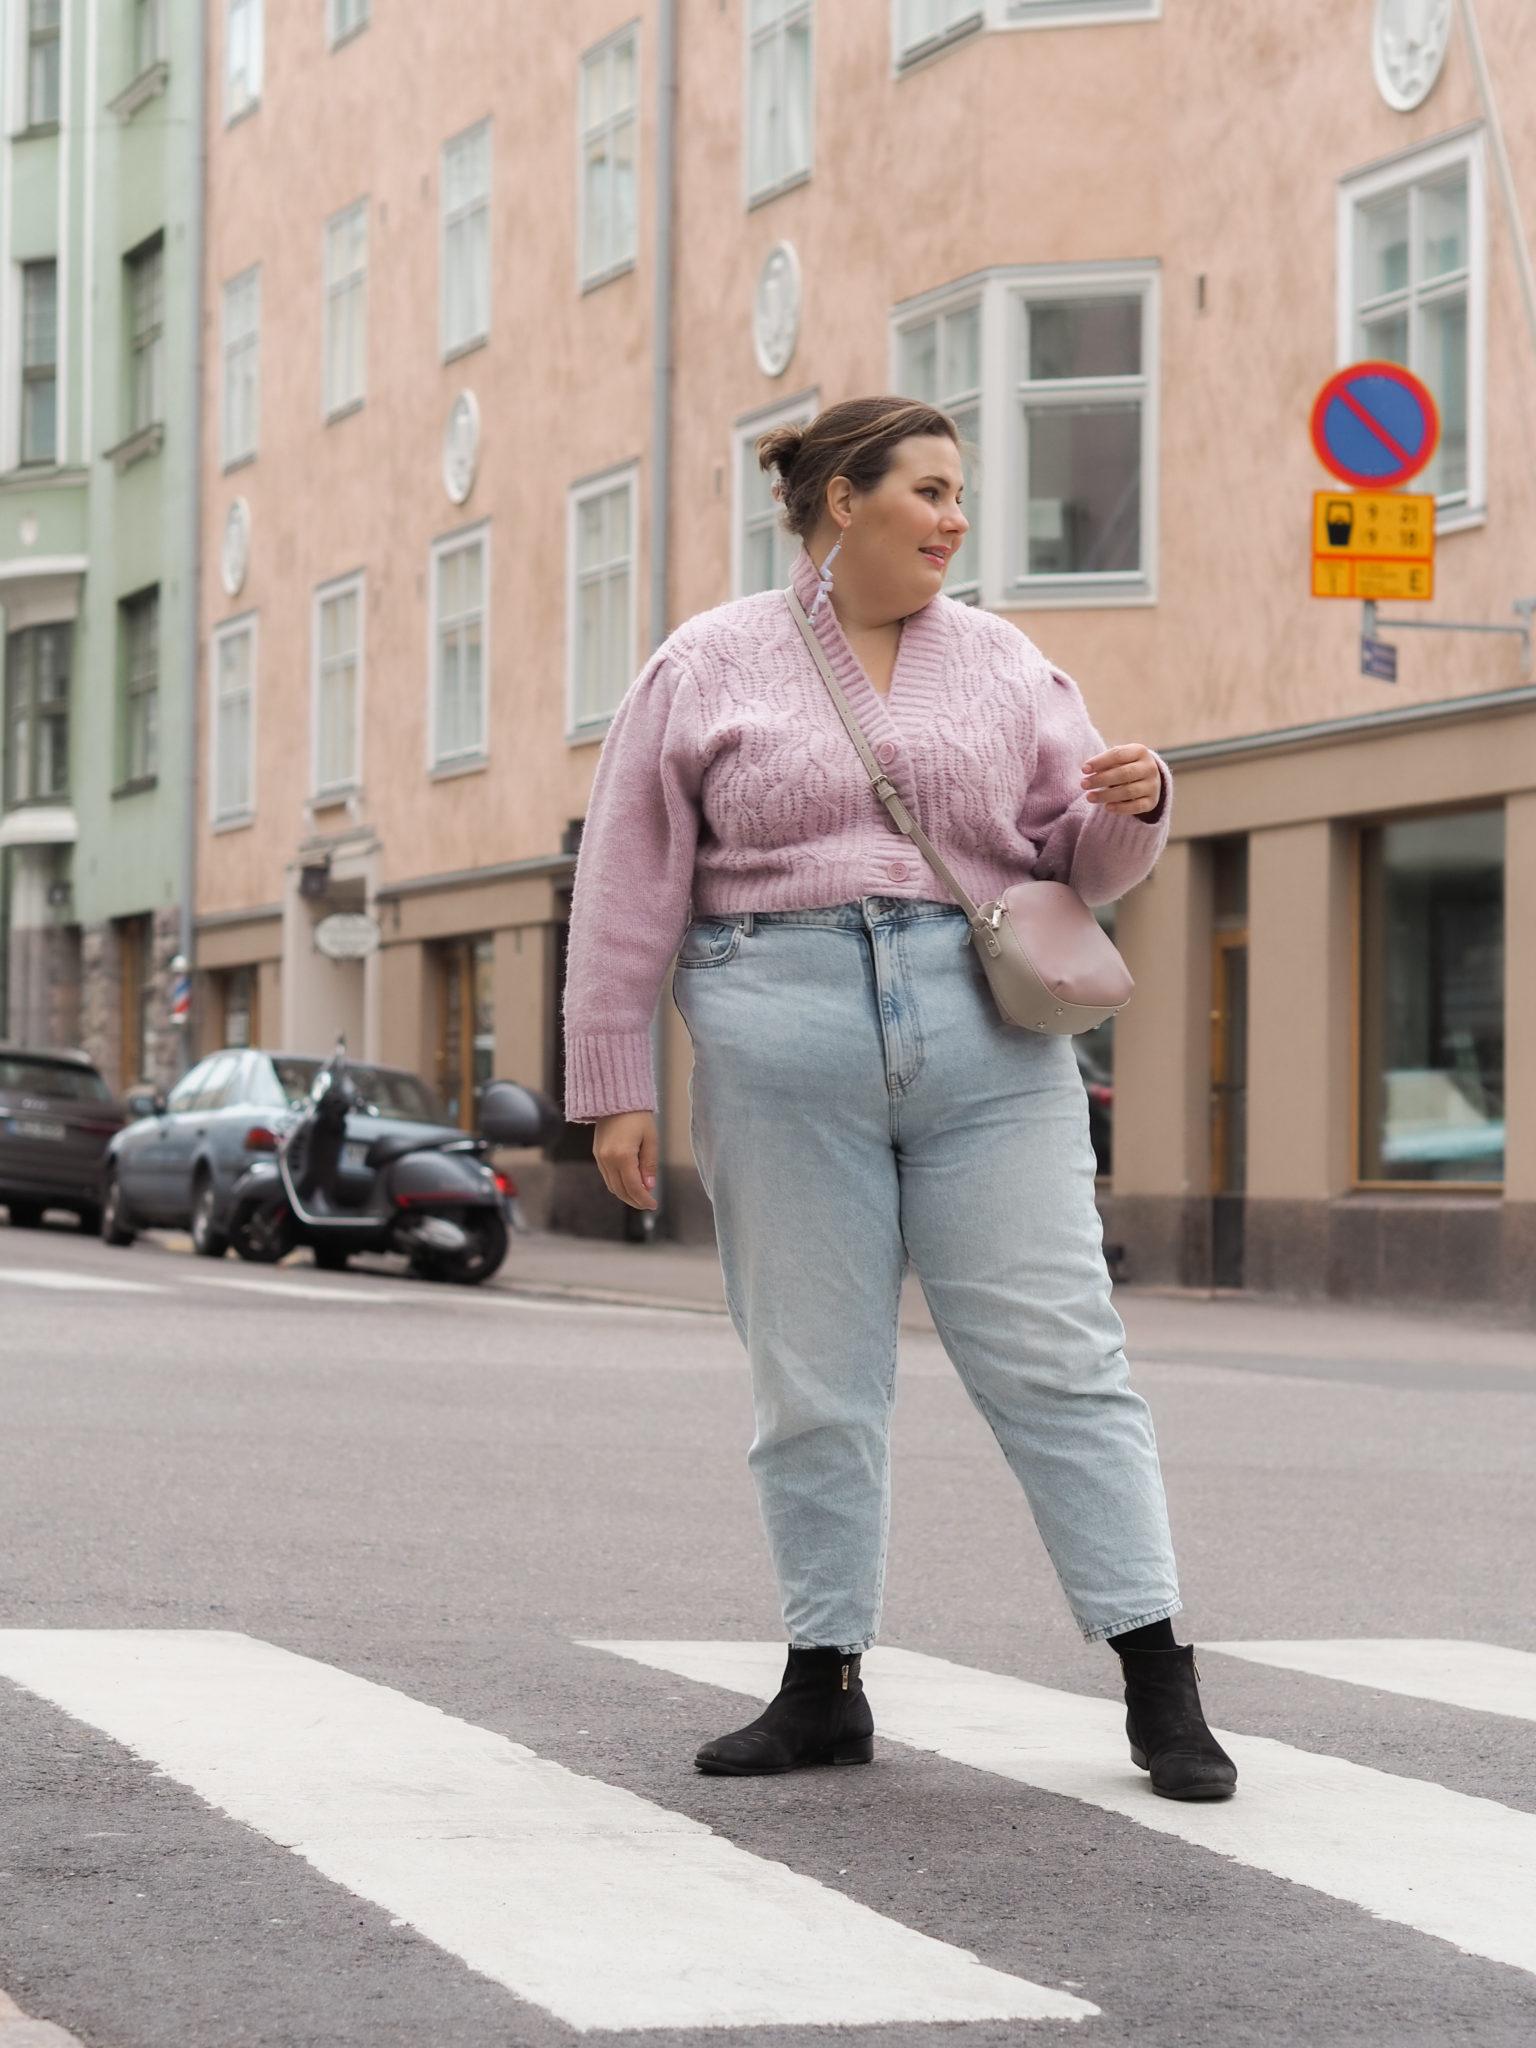 Kuva Katri Konderla - BMH - Big mamas home by Jenni